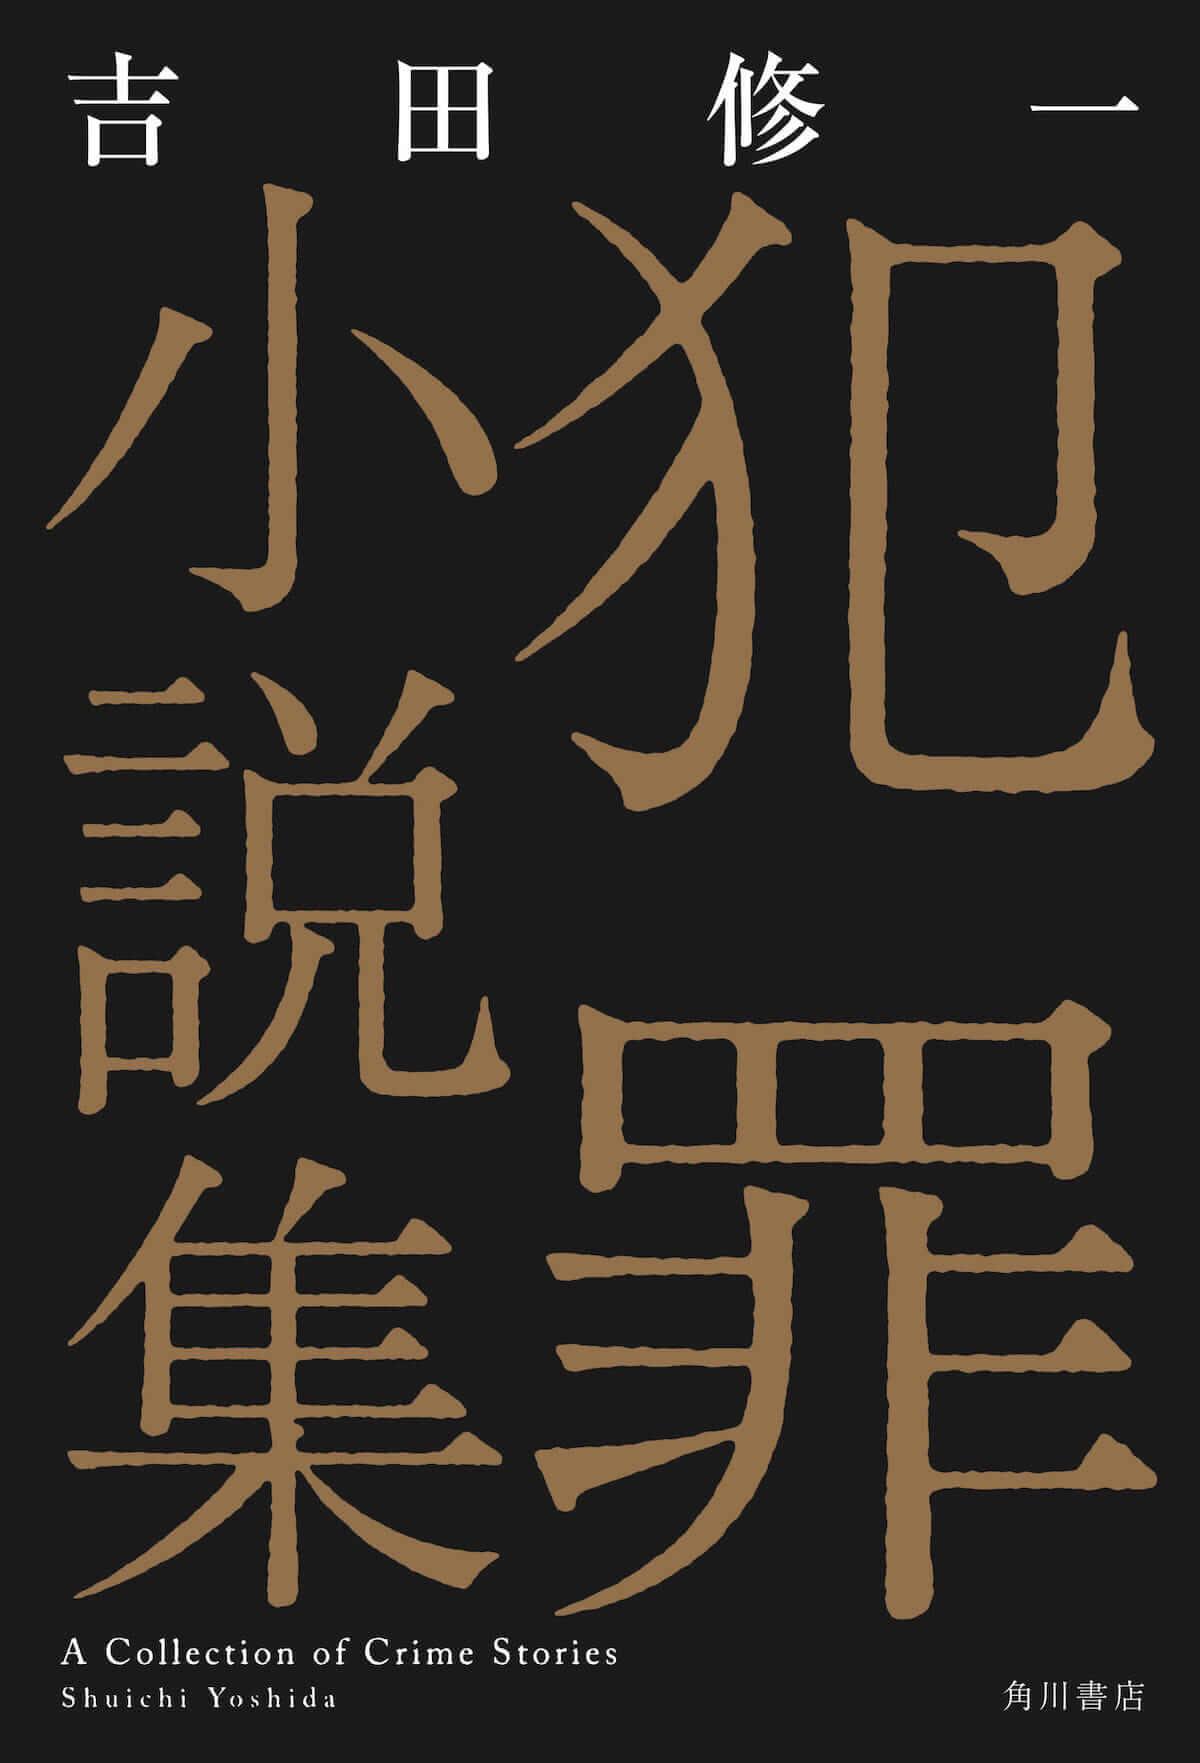 『悪人』、『怒り』に続く吉田修一原作『犯罪小説集』の映画化決定!綾野剛、杉咲花、佐藤浩市らの出演発表! film180820_rakuen_2-1200x1763